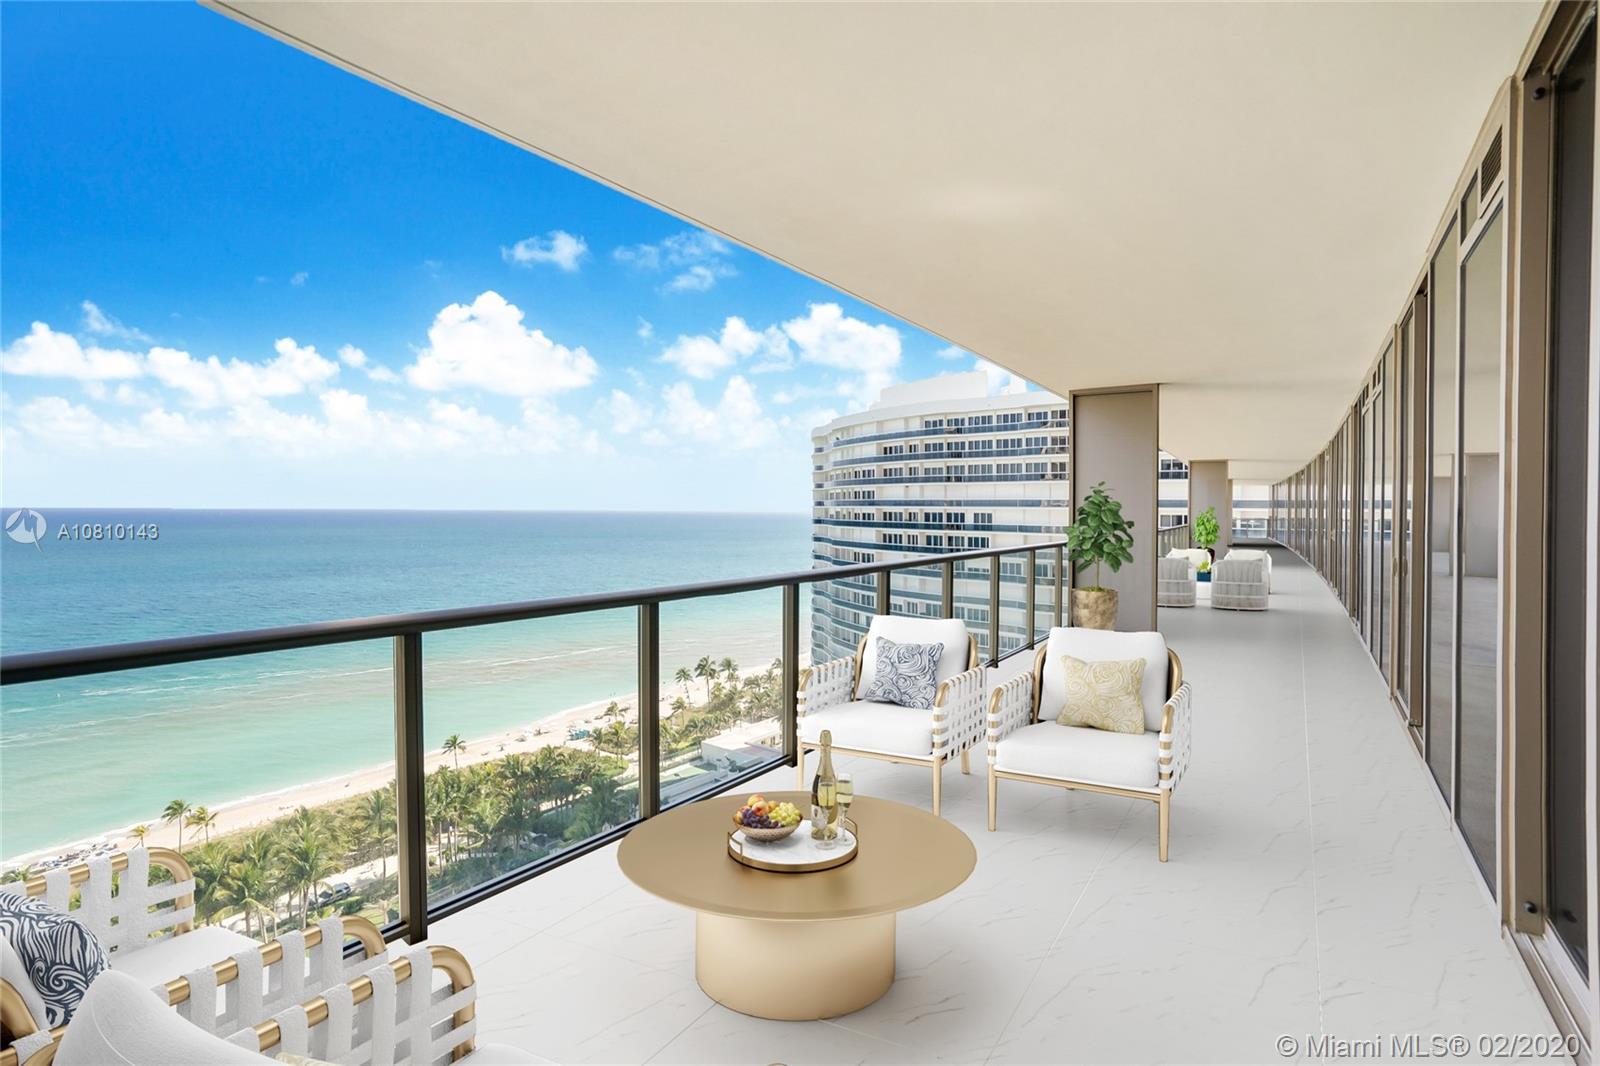 9701 Collins Ave #1701S, Bal Harbour, FL 33154 - Bal Harbour, FL real estate listing